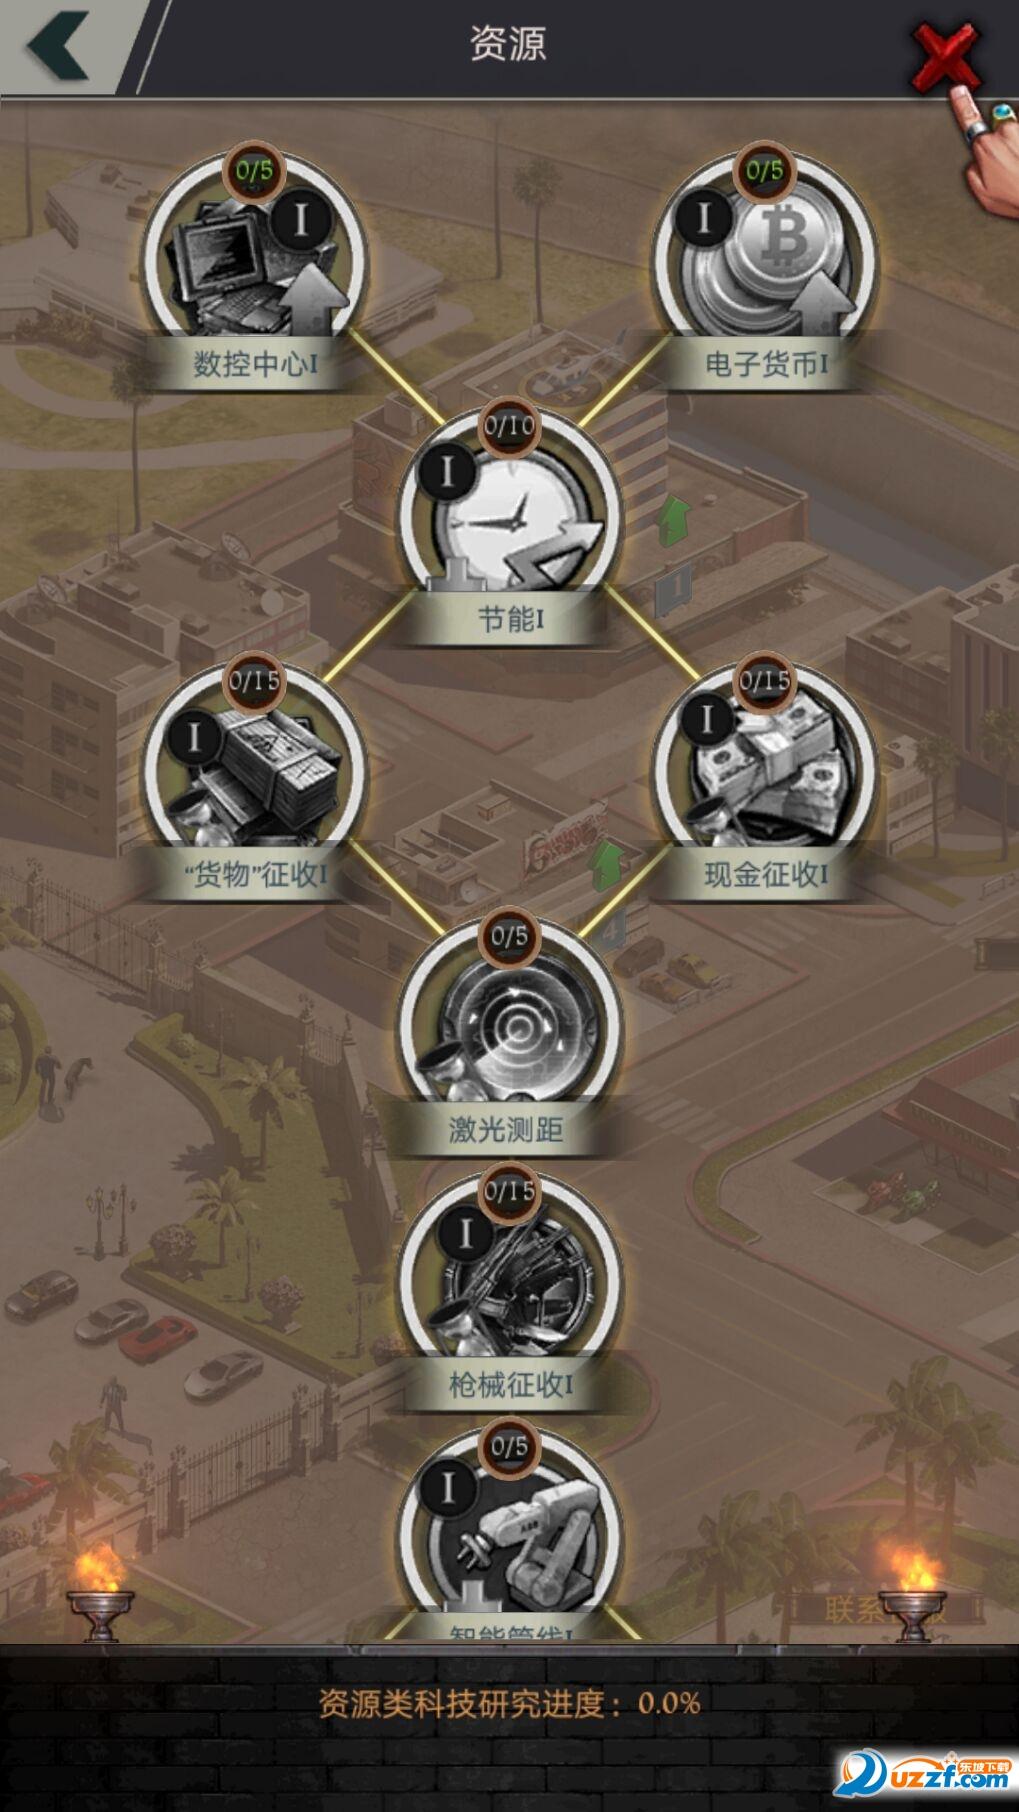 Gang Strike模拟游戏截图